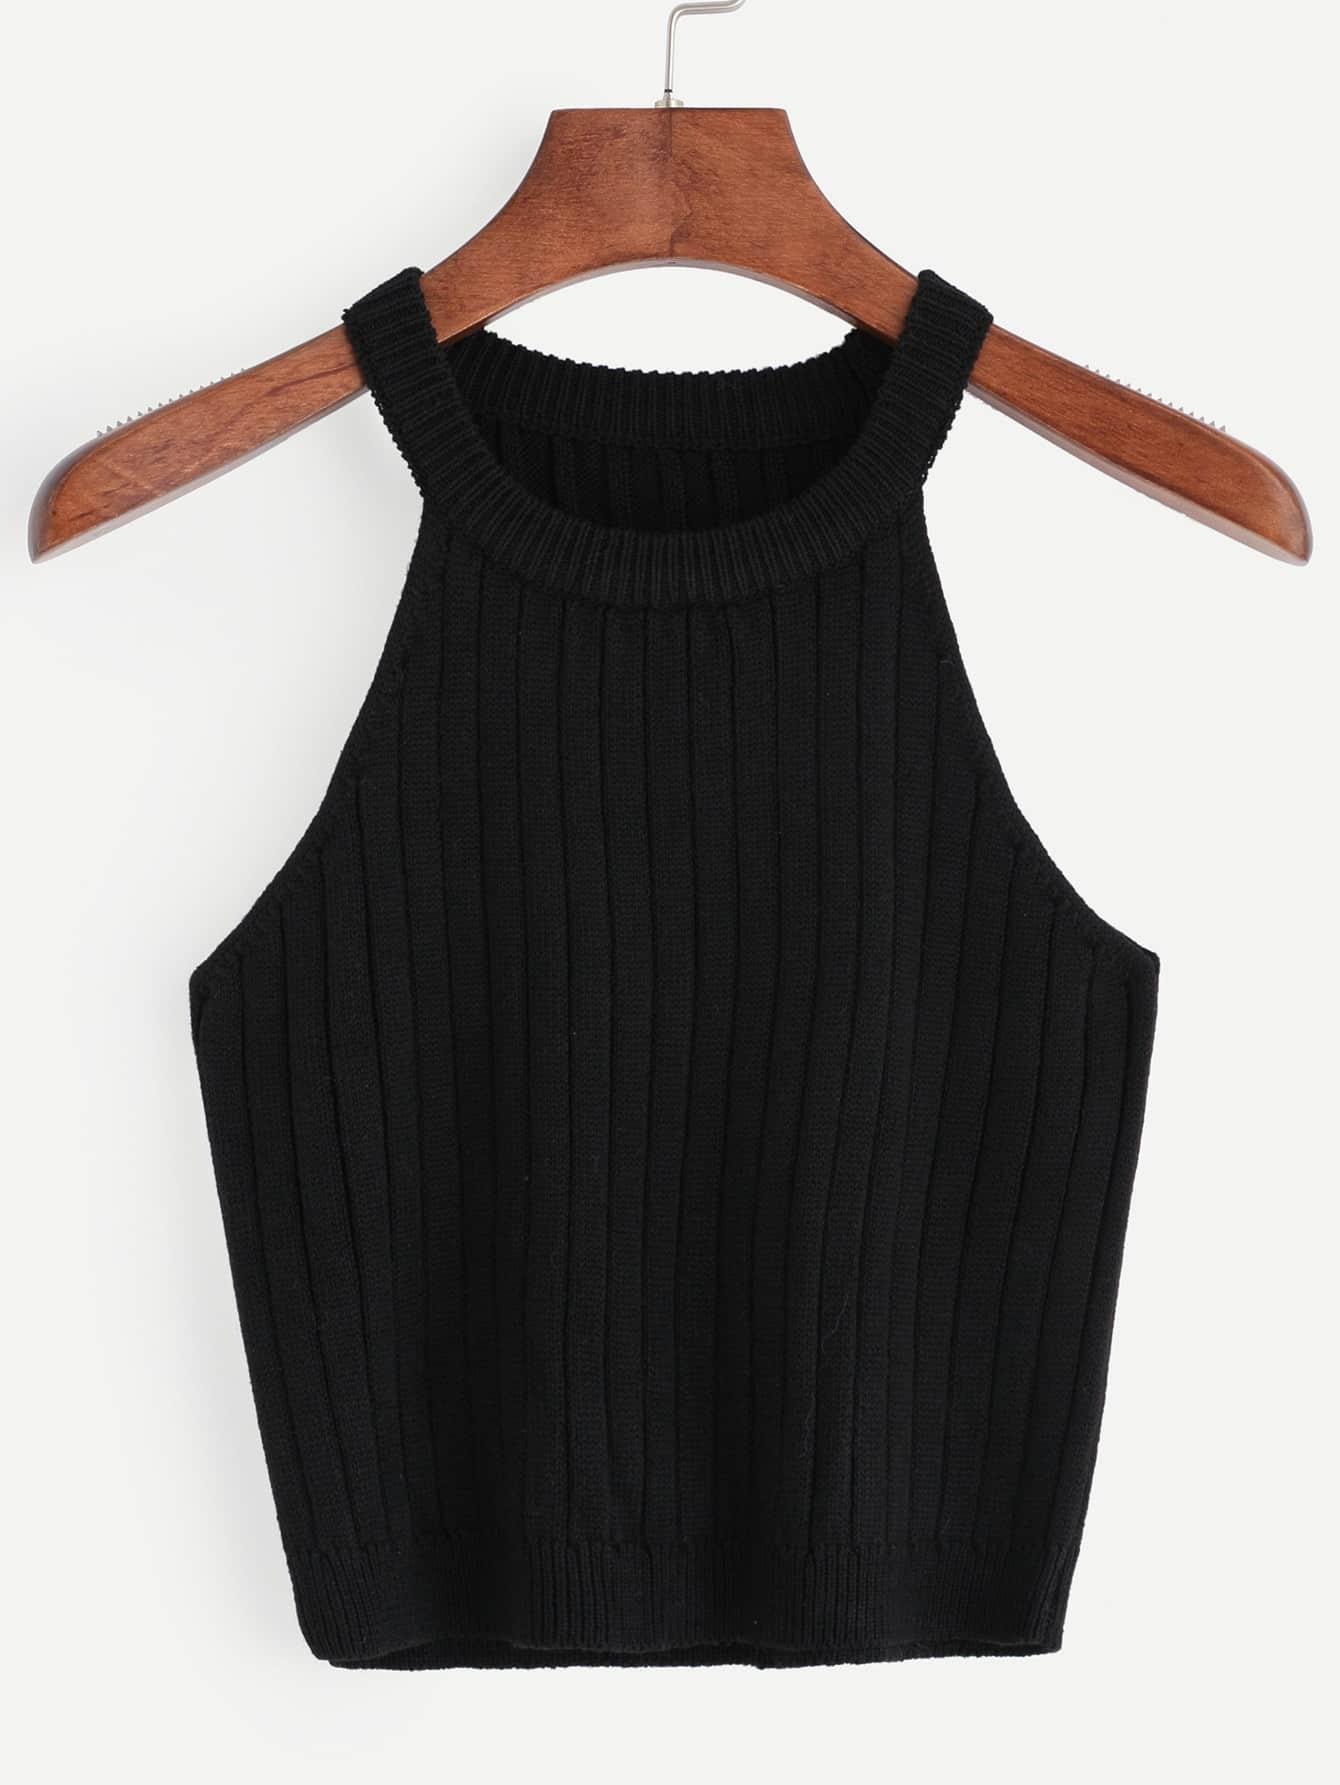 Black Knitted Tank TopBlack Knitted Tank Top<br><br>color: Black<br>size: one-size